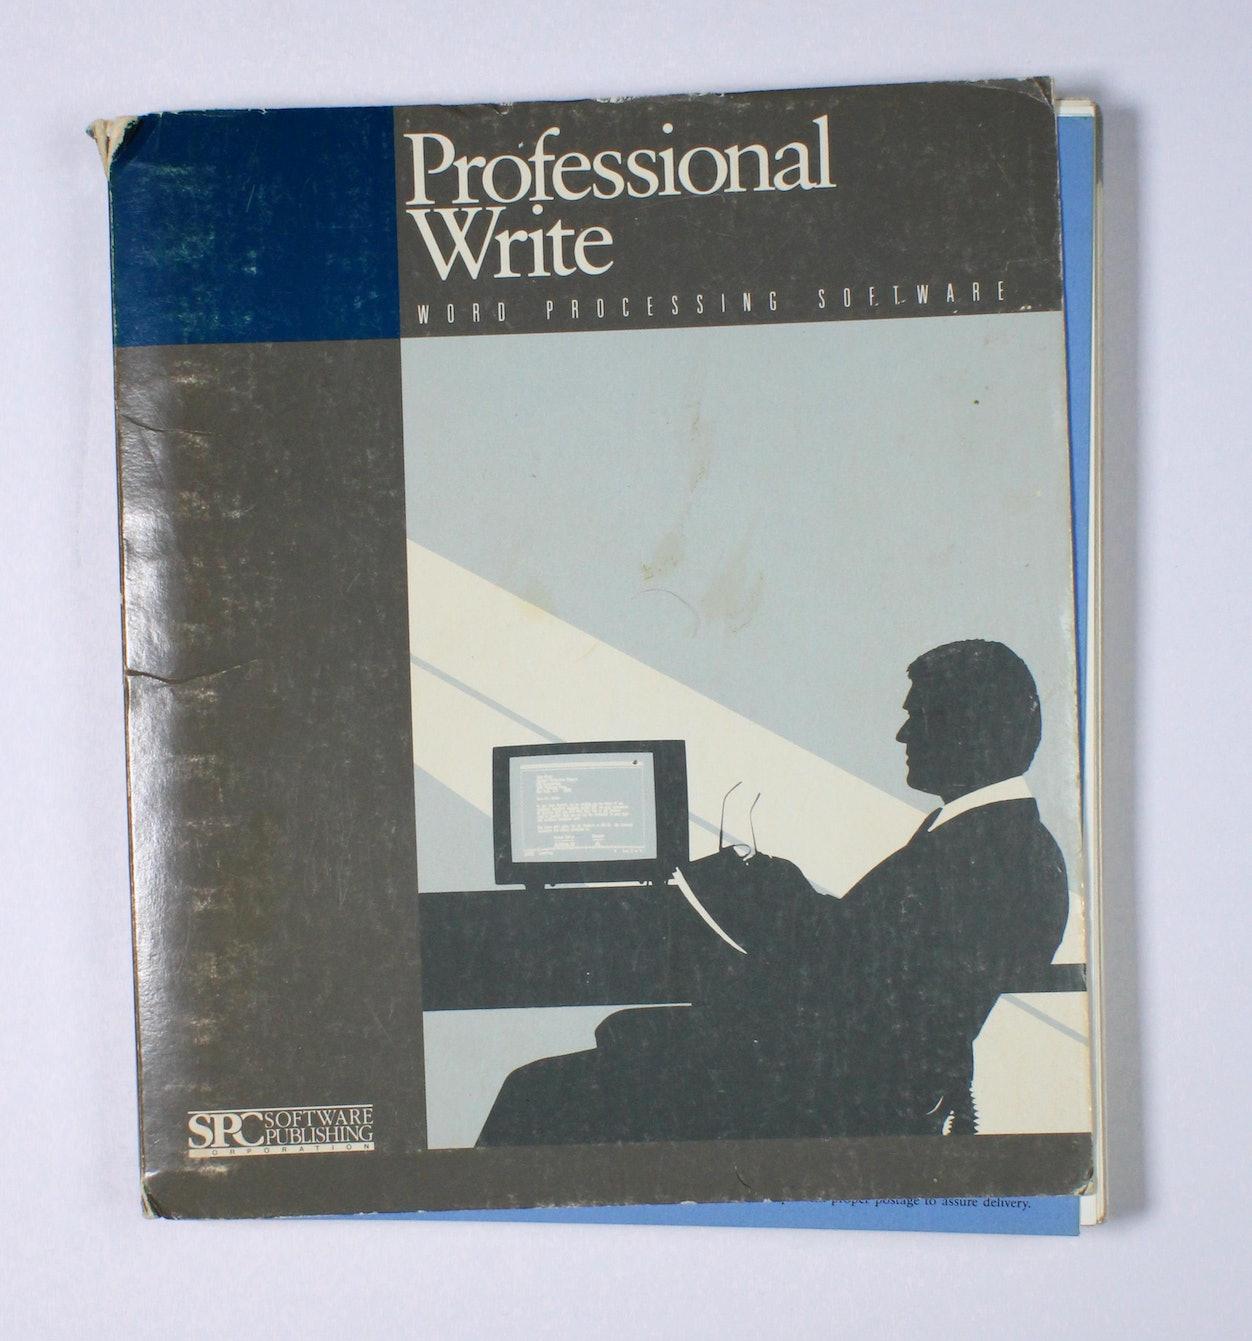 Professional Write - User's Manual